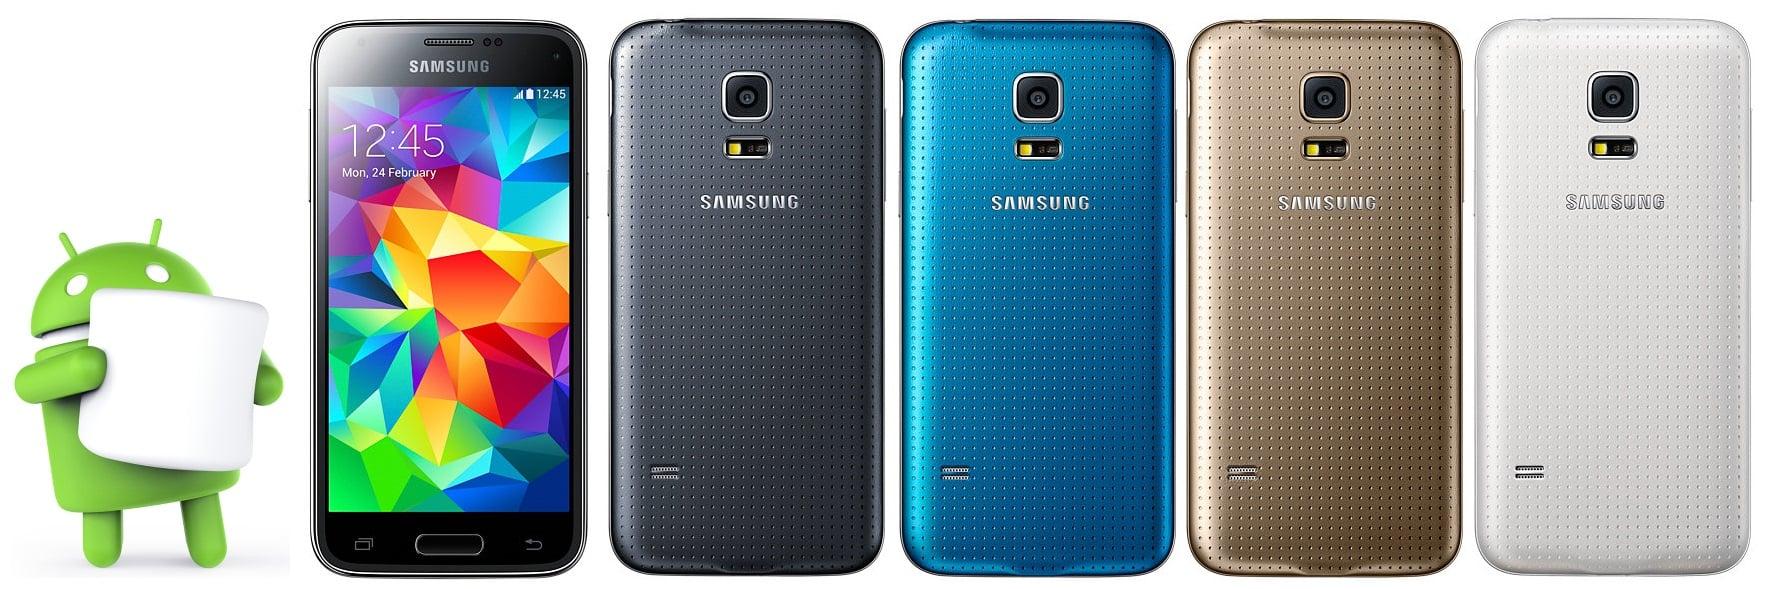 Samsung Galaxy S5 Mini Android 6.0.1 Marshmallow